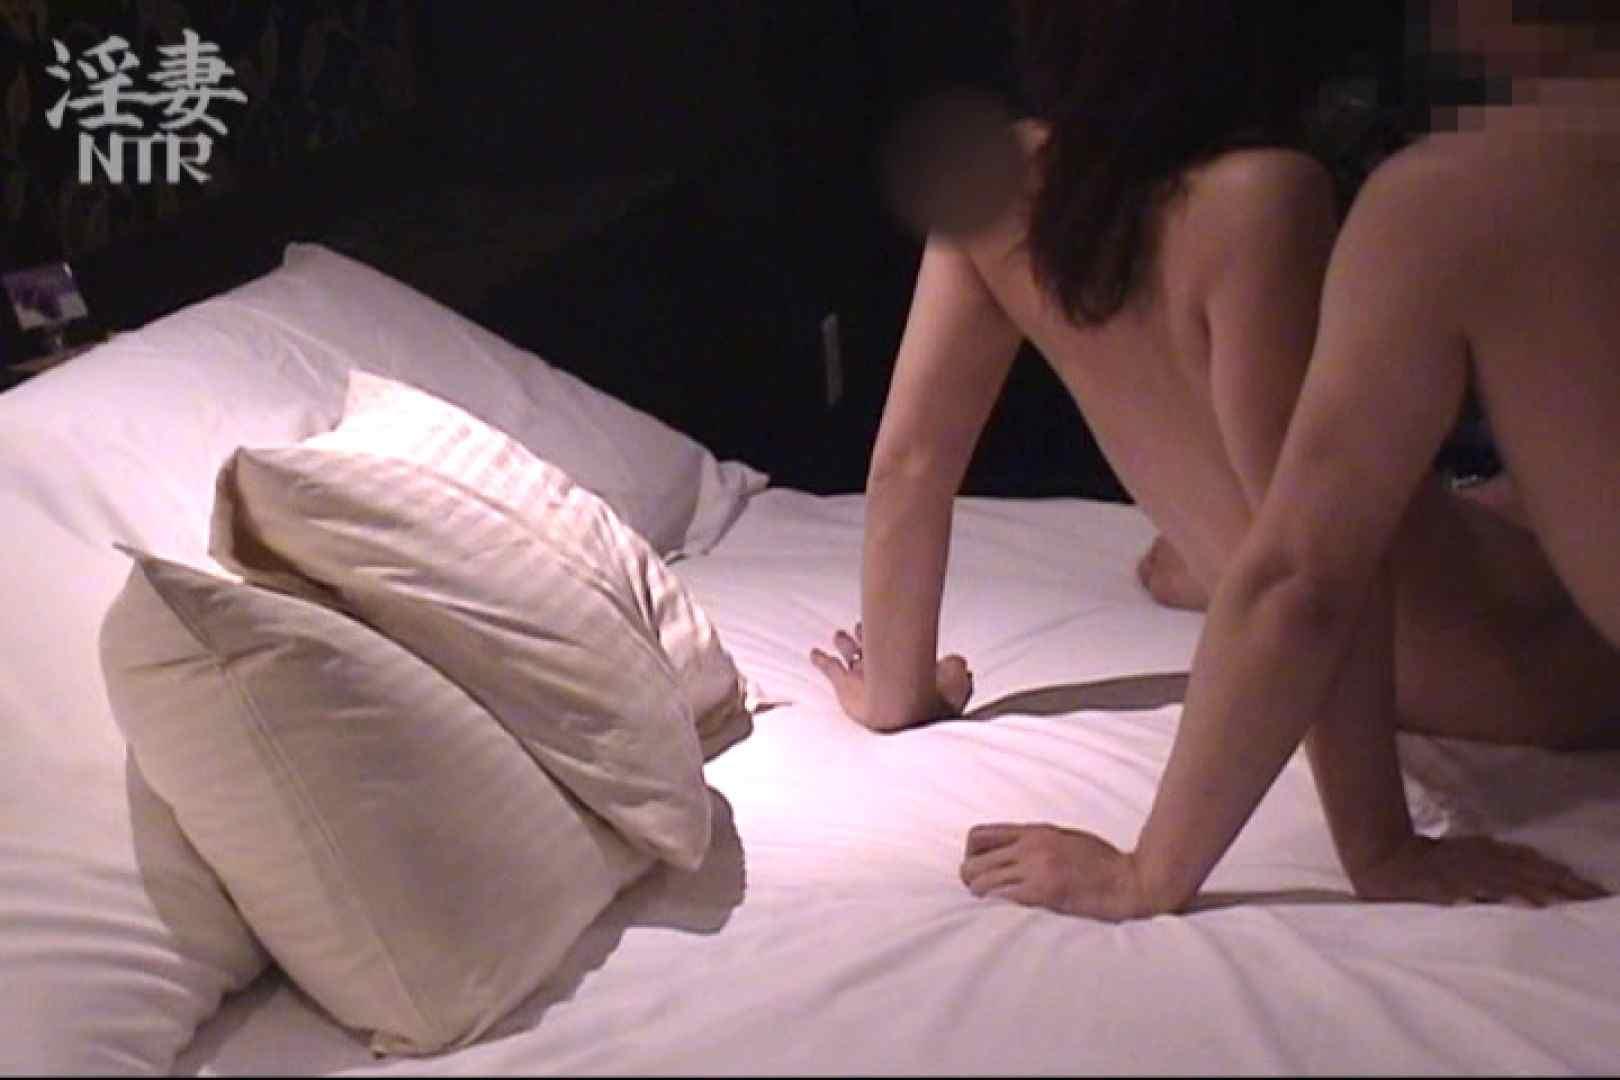 淫乱彩女 麻優里 28歳の単独男性の他人棒 2 一般投稿 AV無料 107pic 74